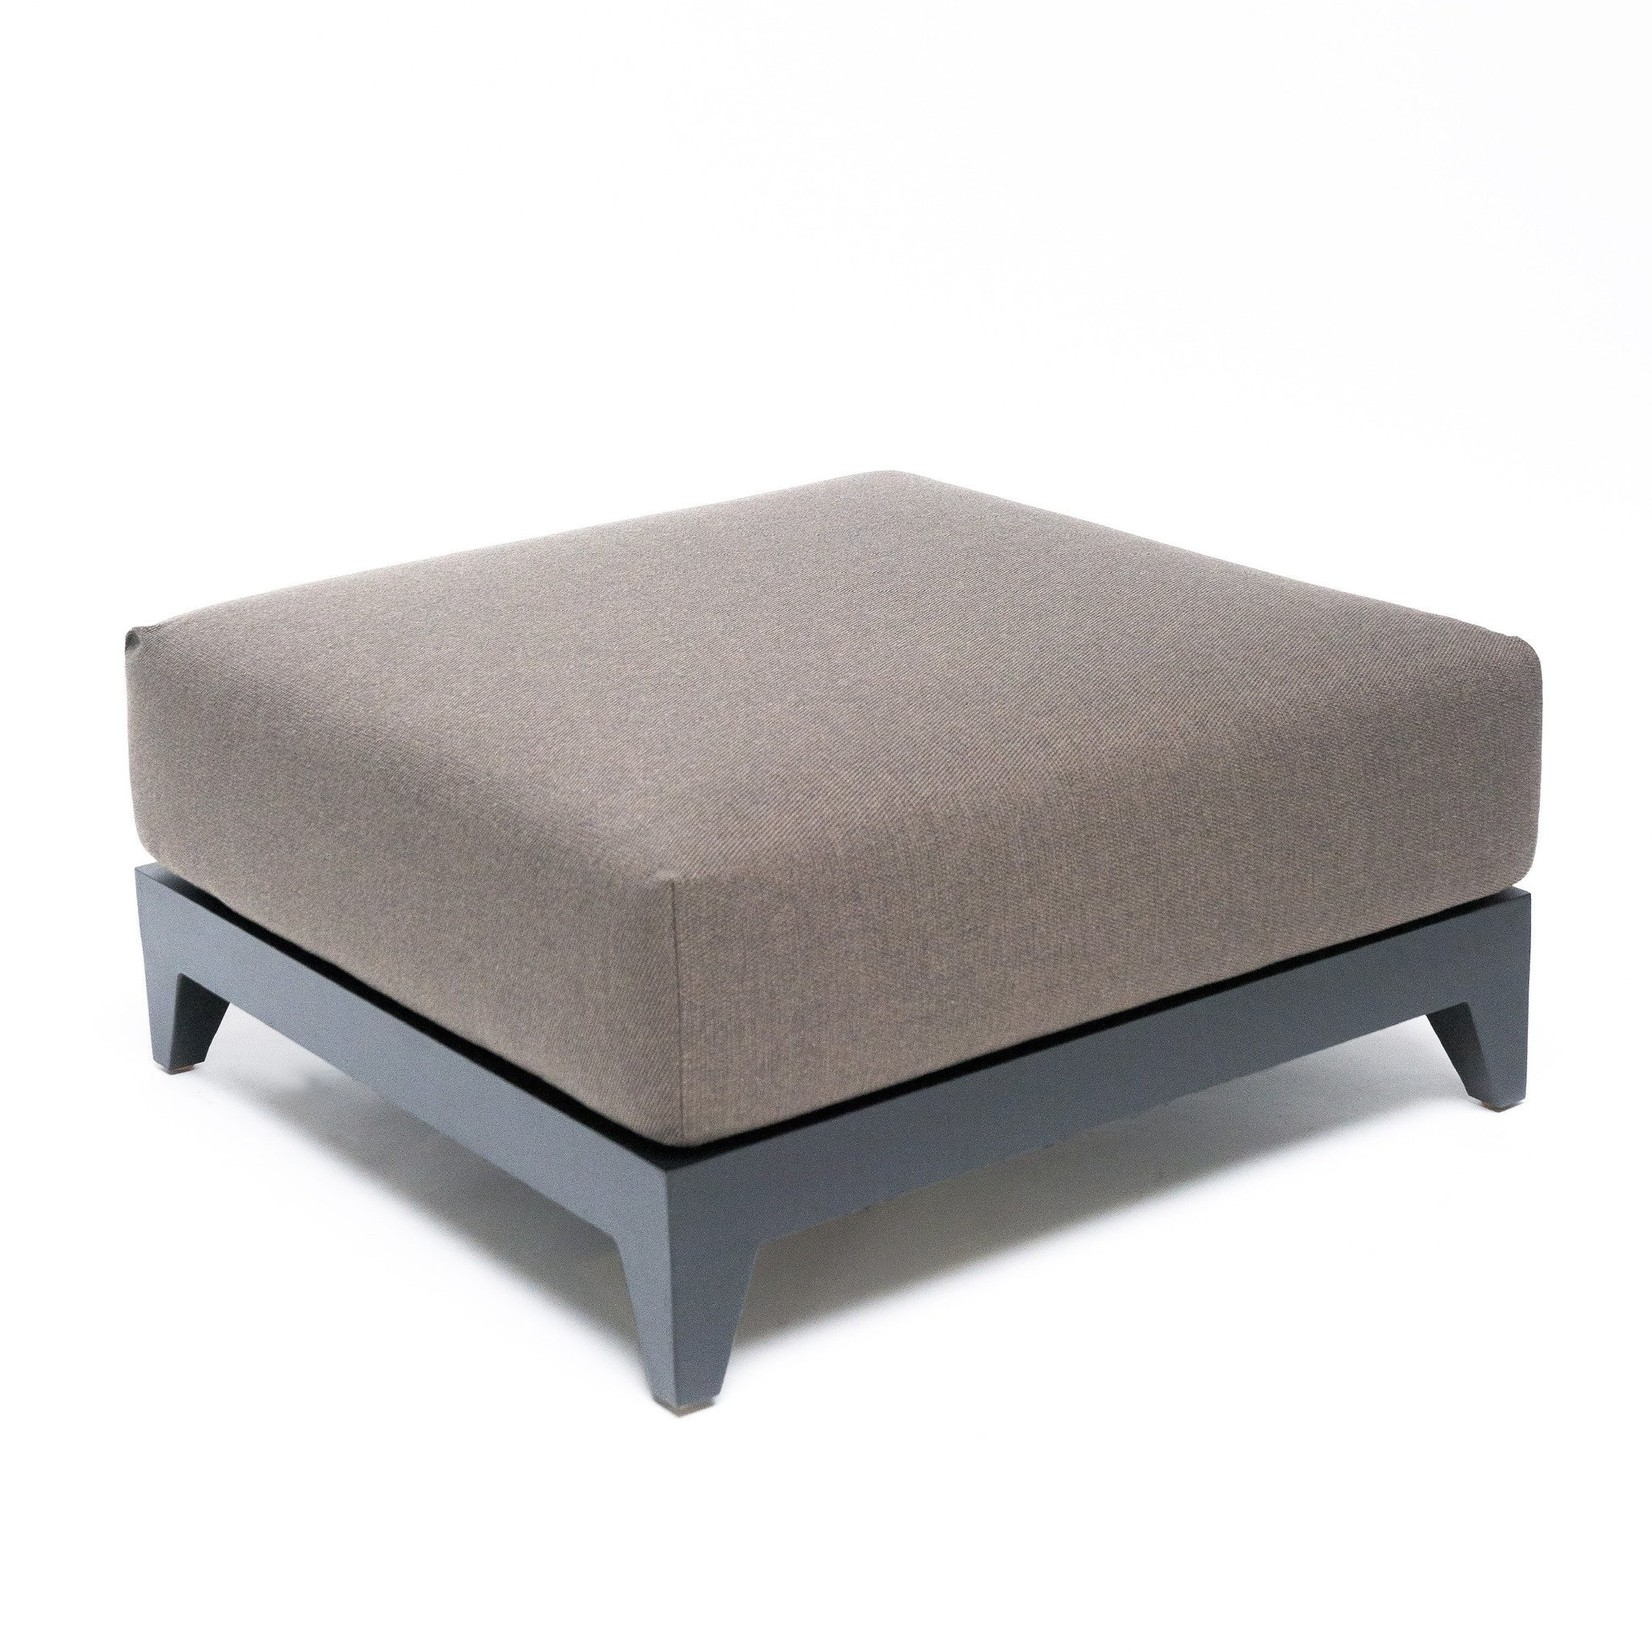 Gommaire Ottoman Mia | Aluminium Matte Black + Cushion